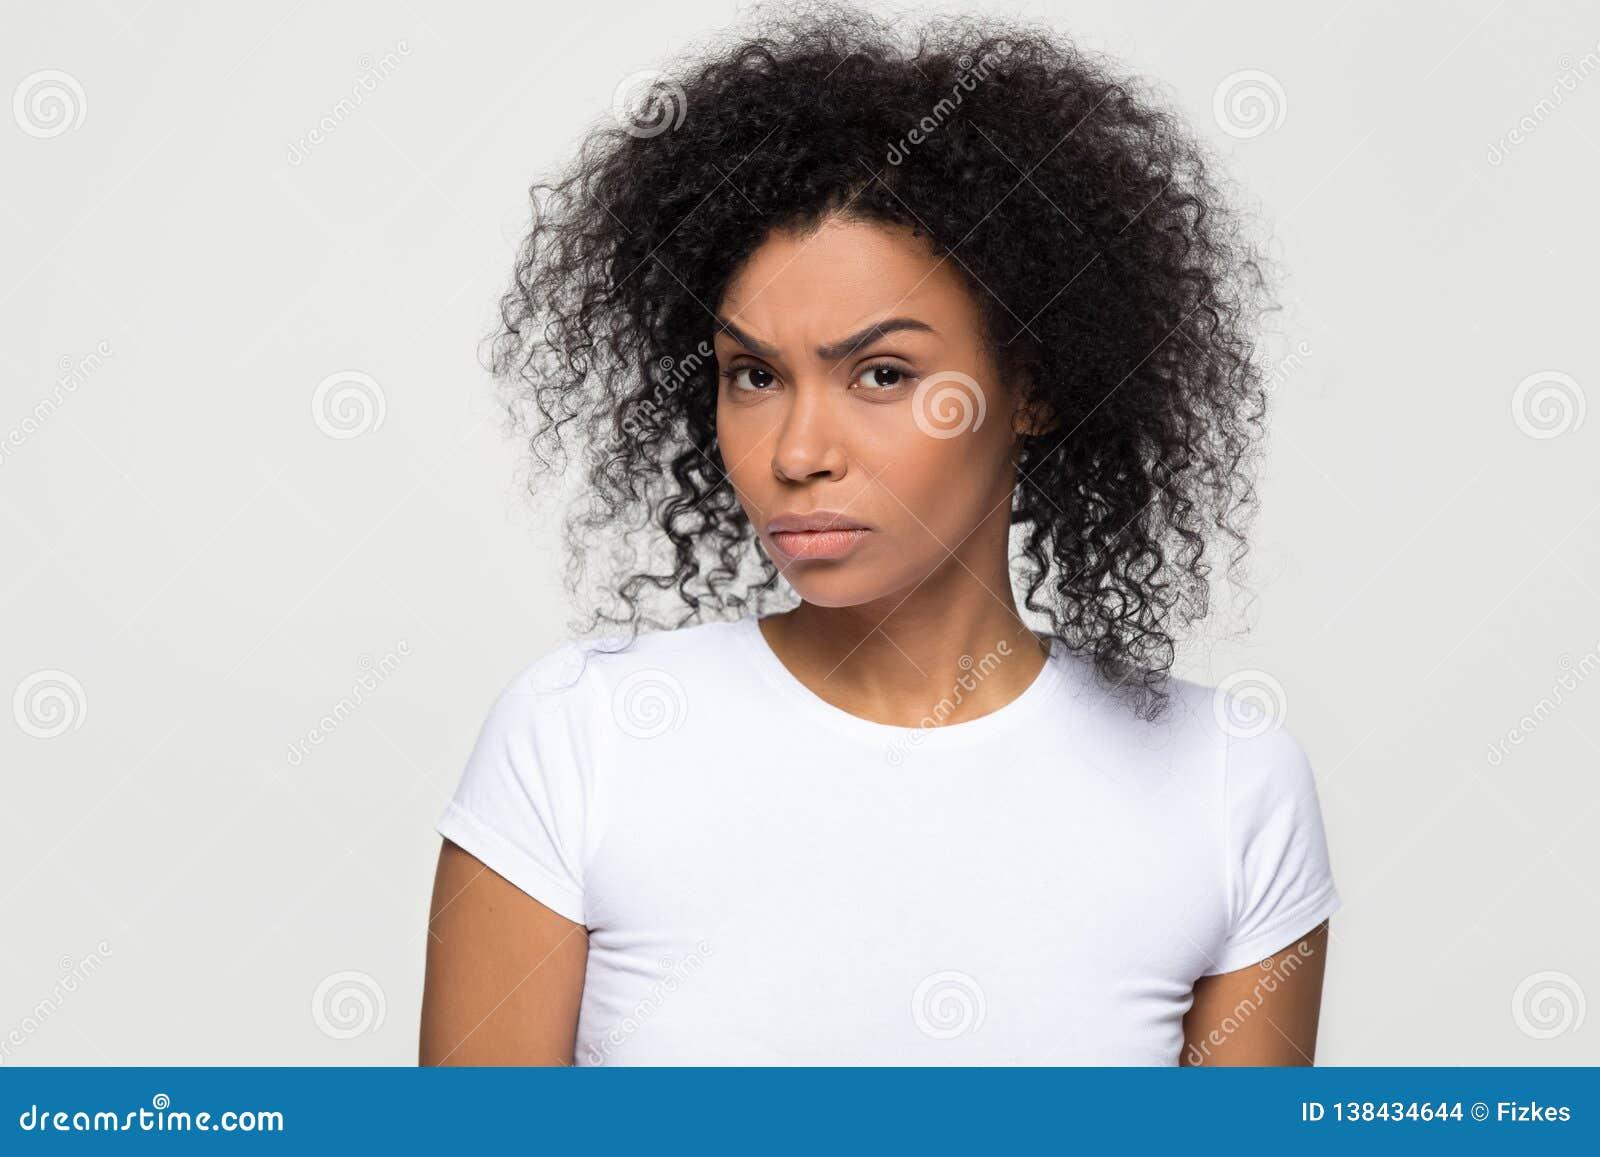 Femme africaine méfiante avec le visage méfiant regardant la caméra